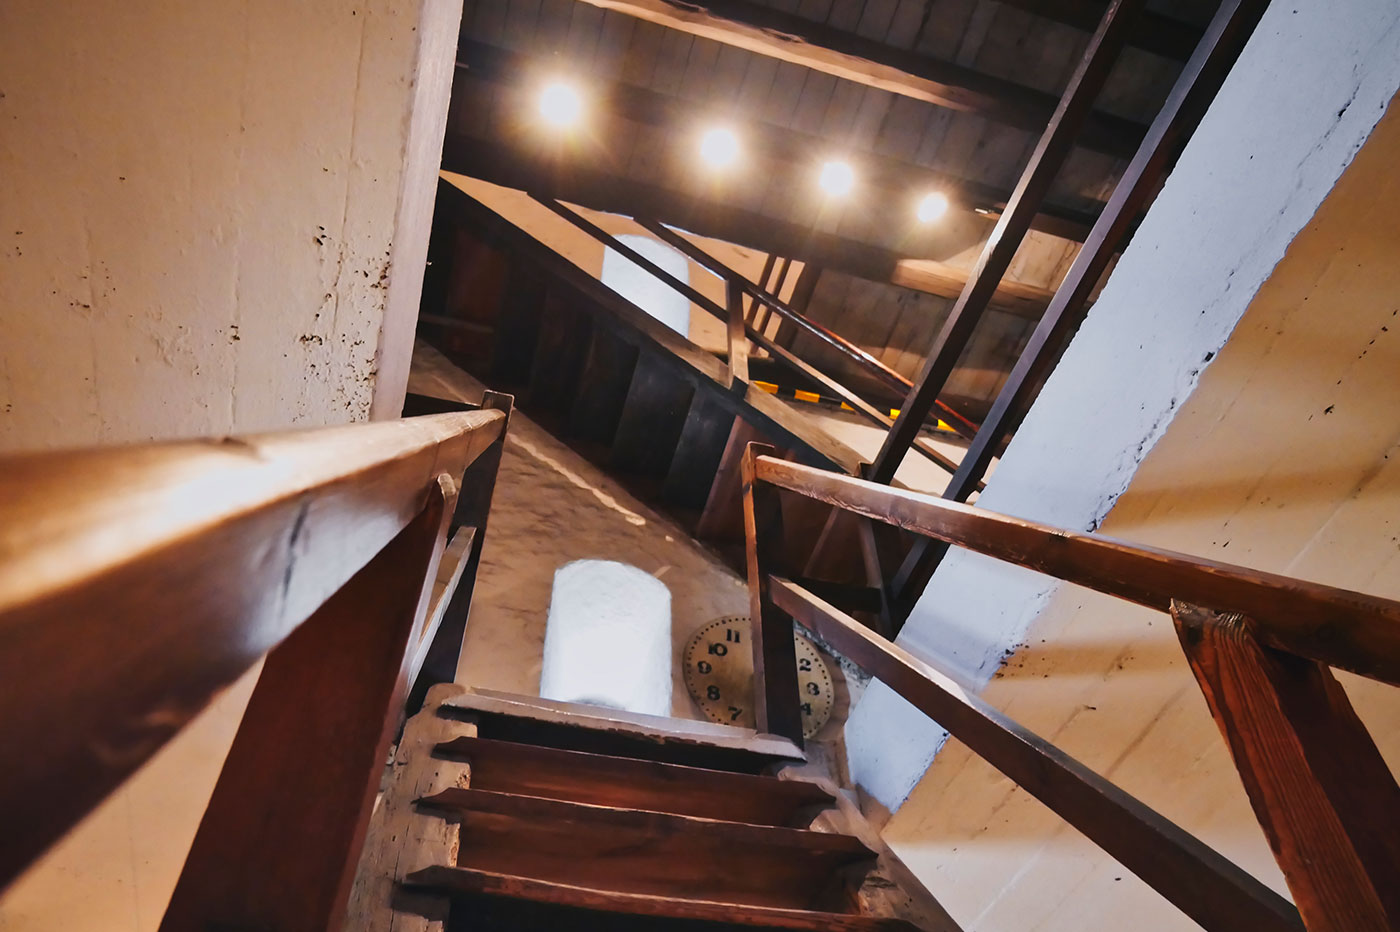 176 Treppen Reichenbacher Turm